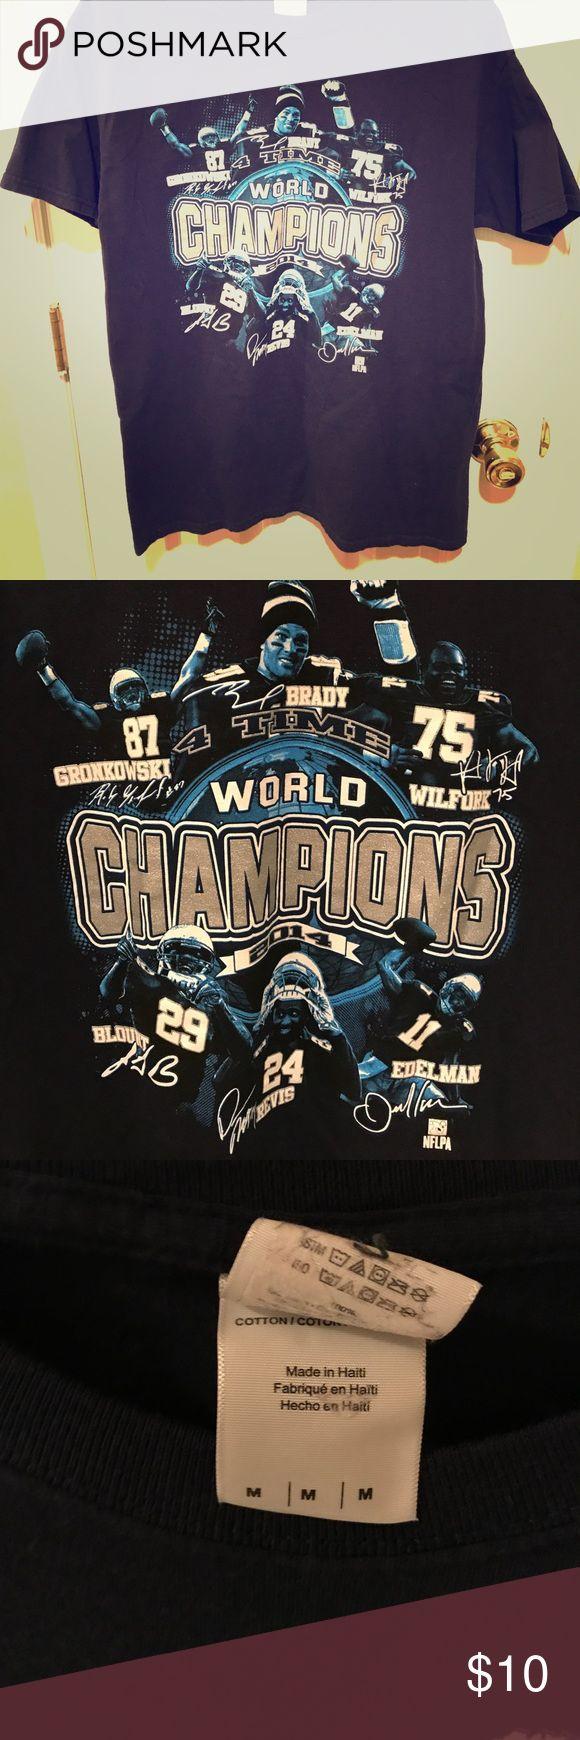 New England Patriots 2014 World Champions Tee New England Patriots 2014 World Champions Tee Gildan Shirts Tees - Short Sleeve